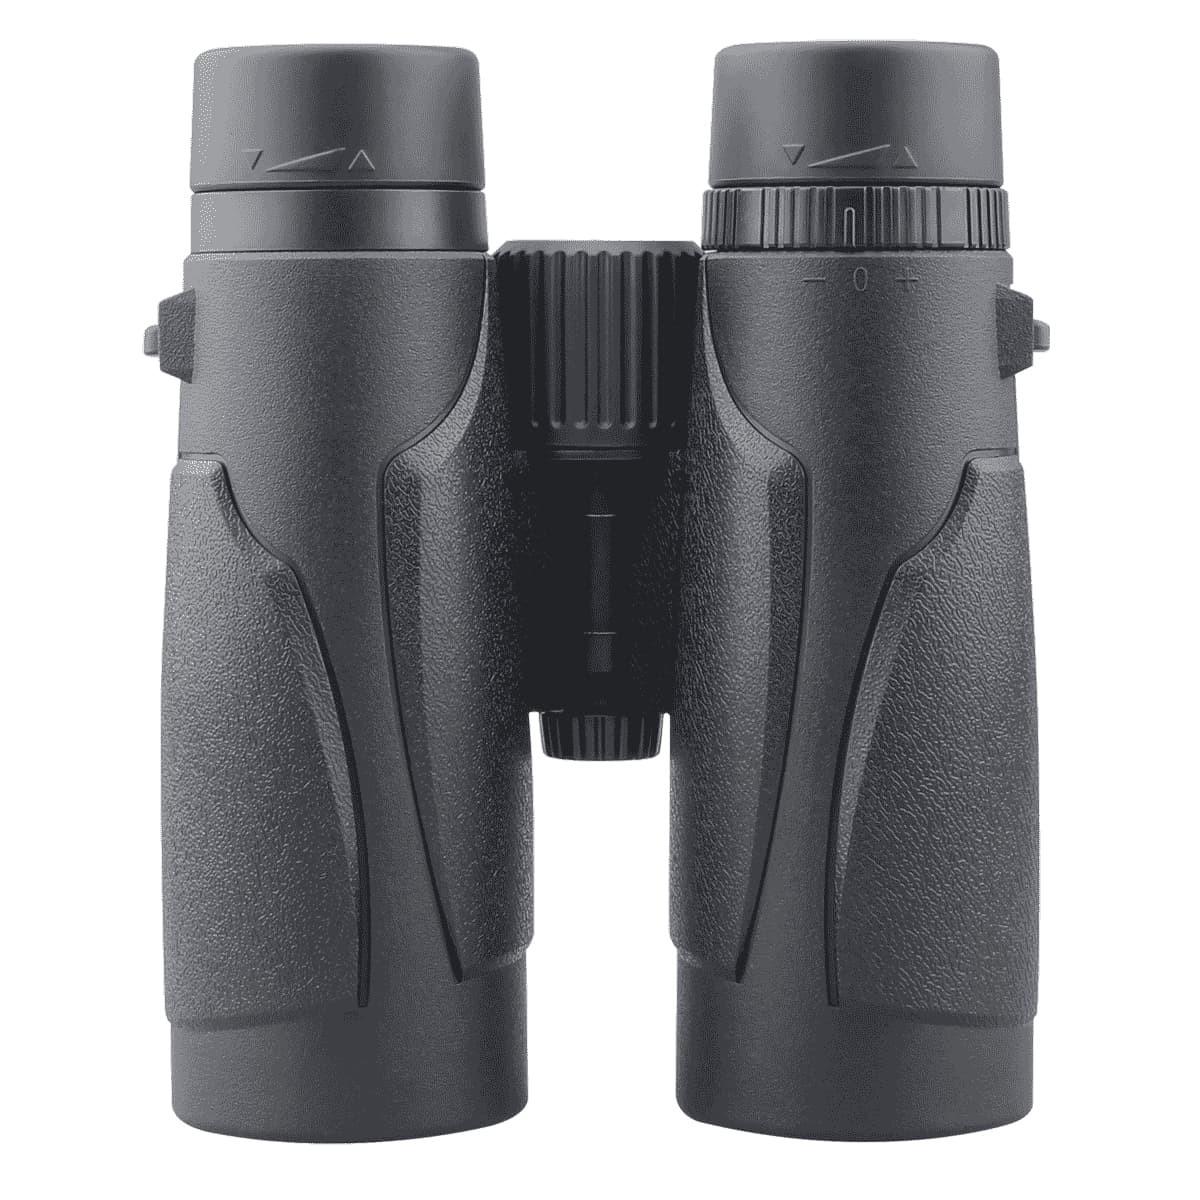 Victoptics 8x42 Binocular